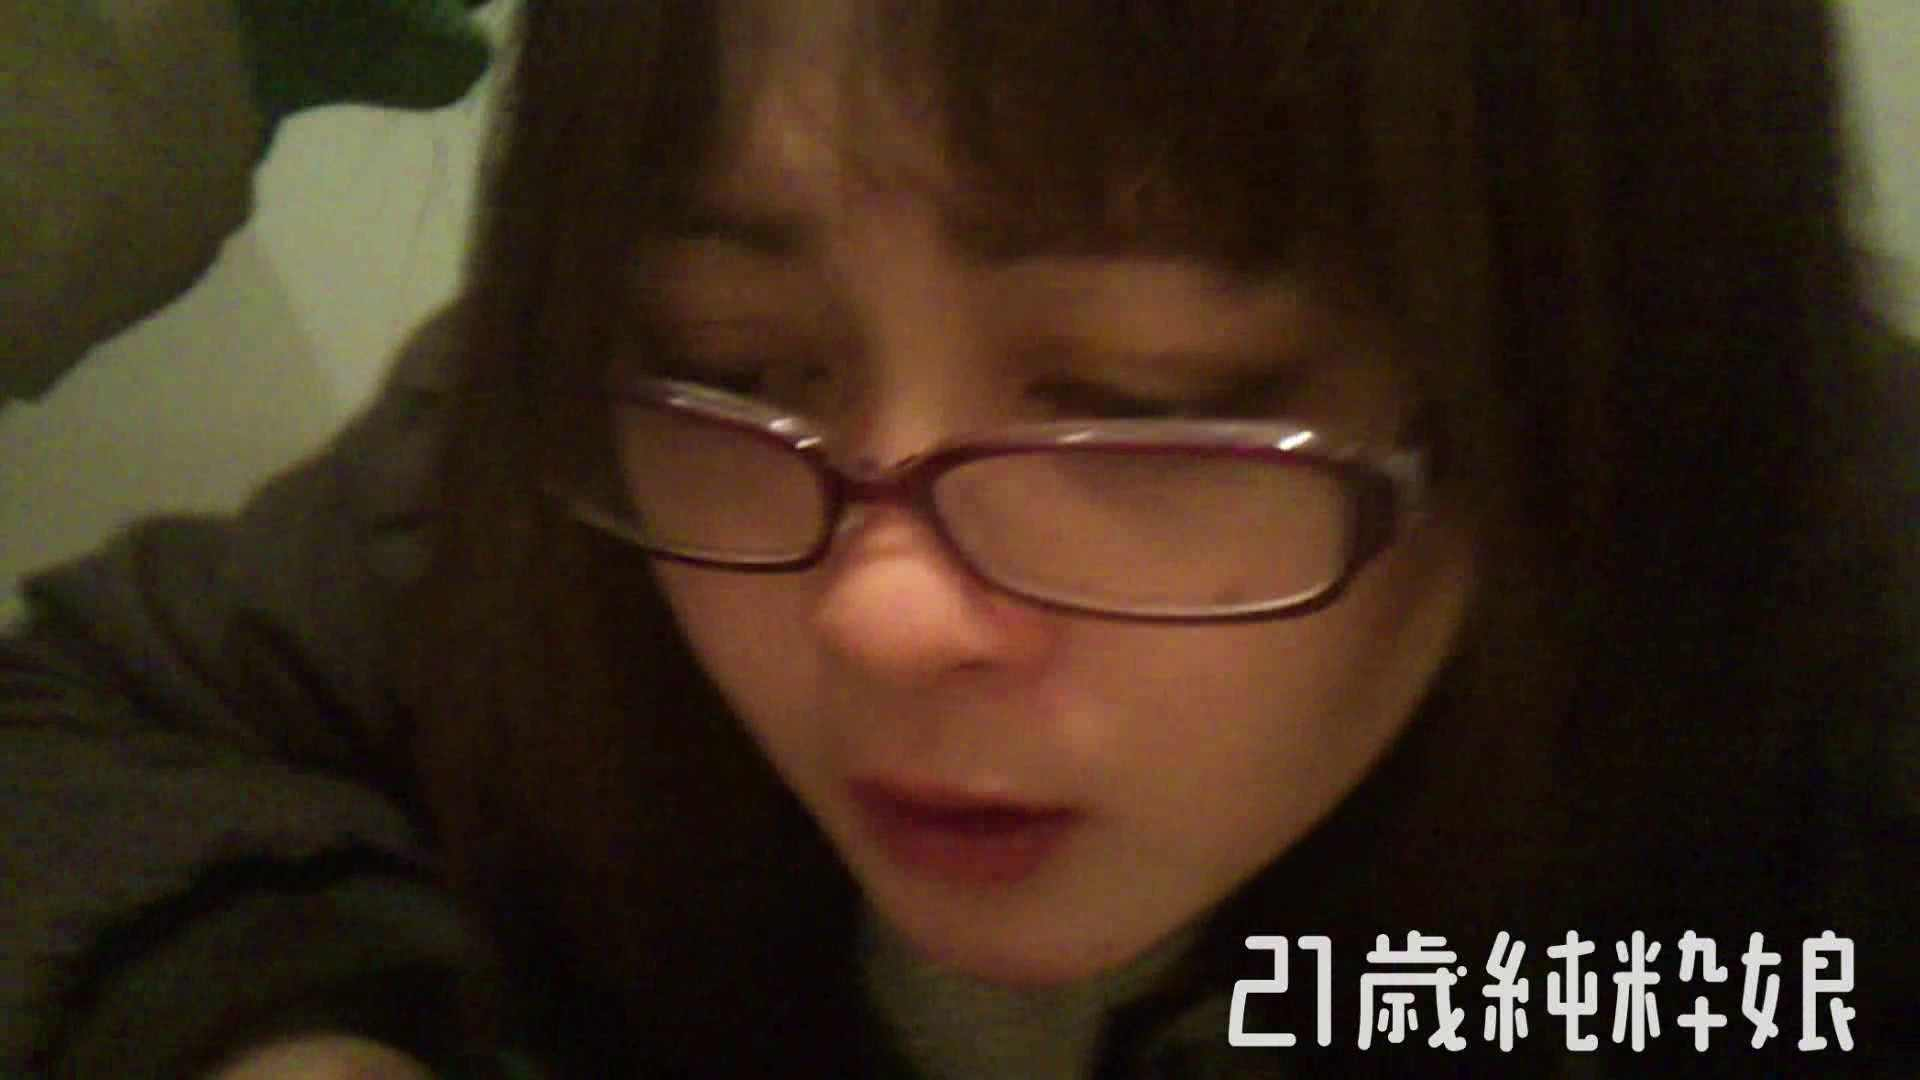 Gカップ21歳純粋嬢第2弾Vol.5 美女OL  78連発 46